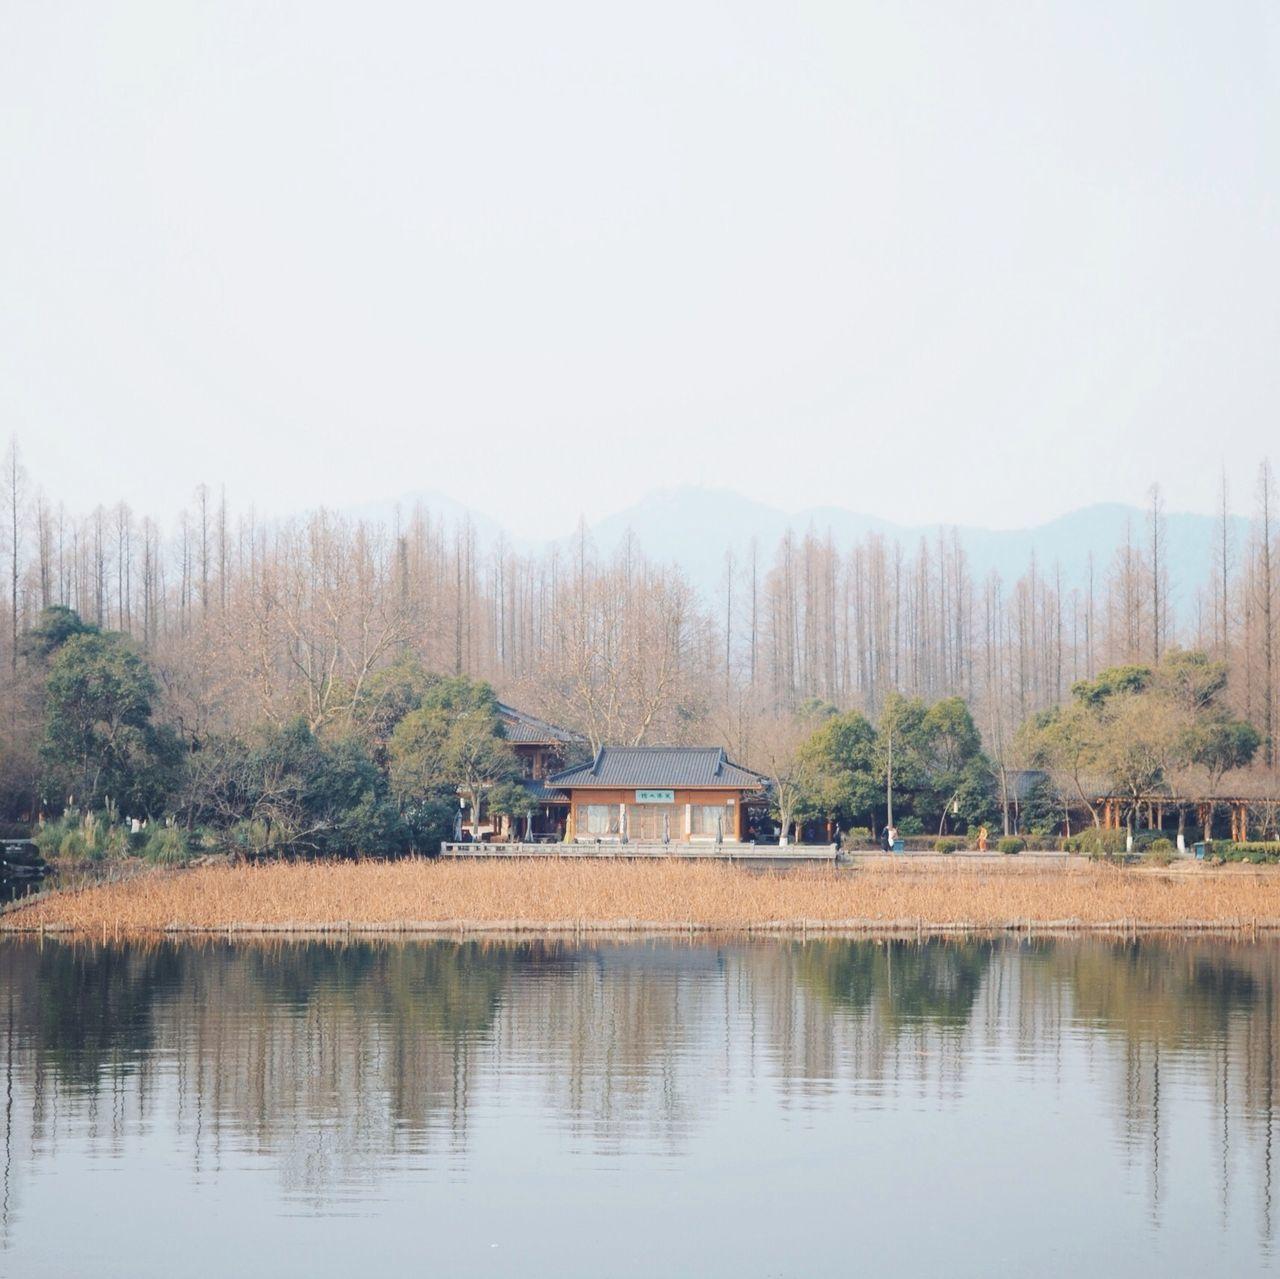 Temple at lakeshore